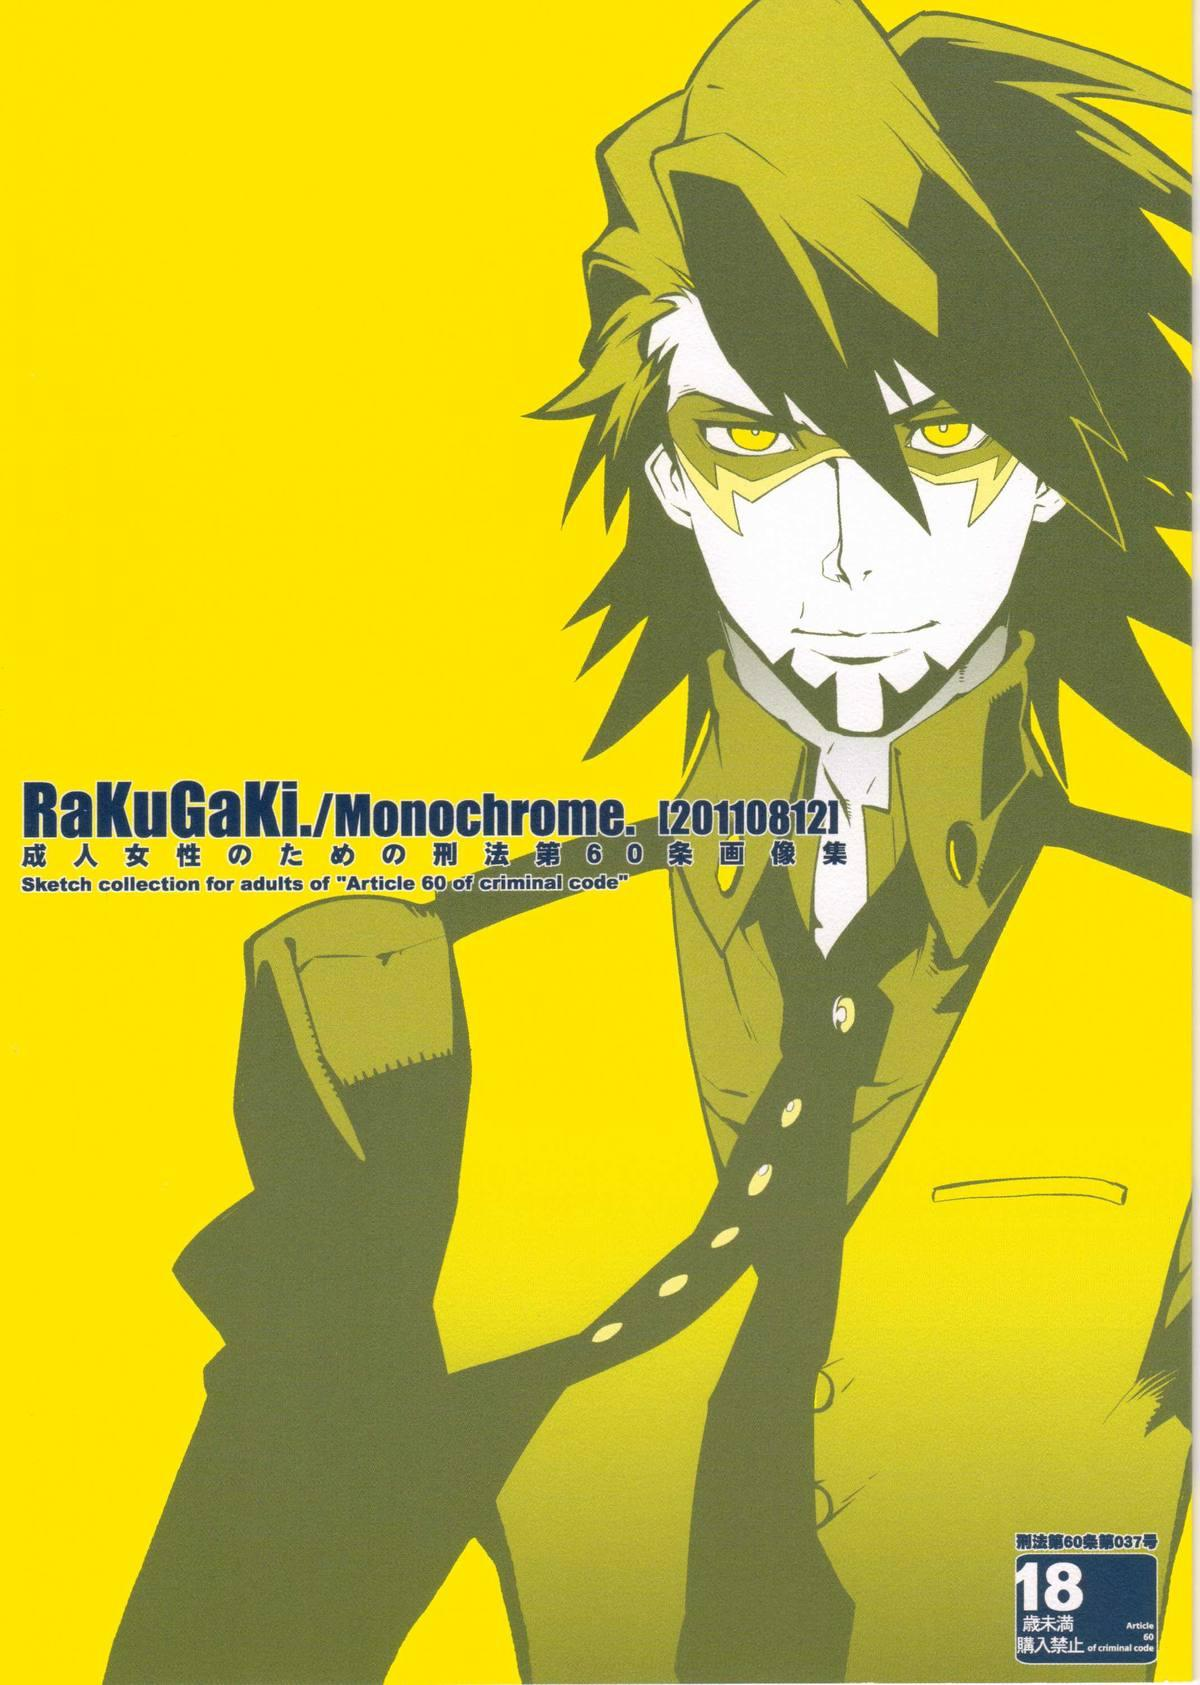 RaKuGaKi./Monochrome. 0